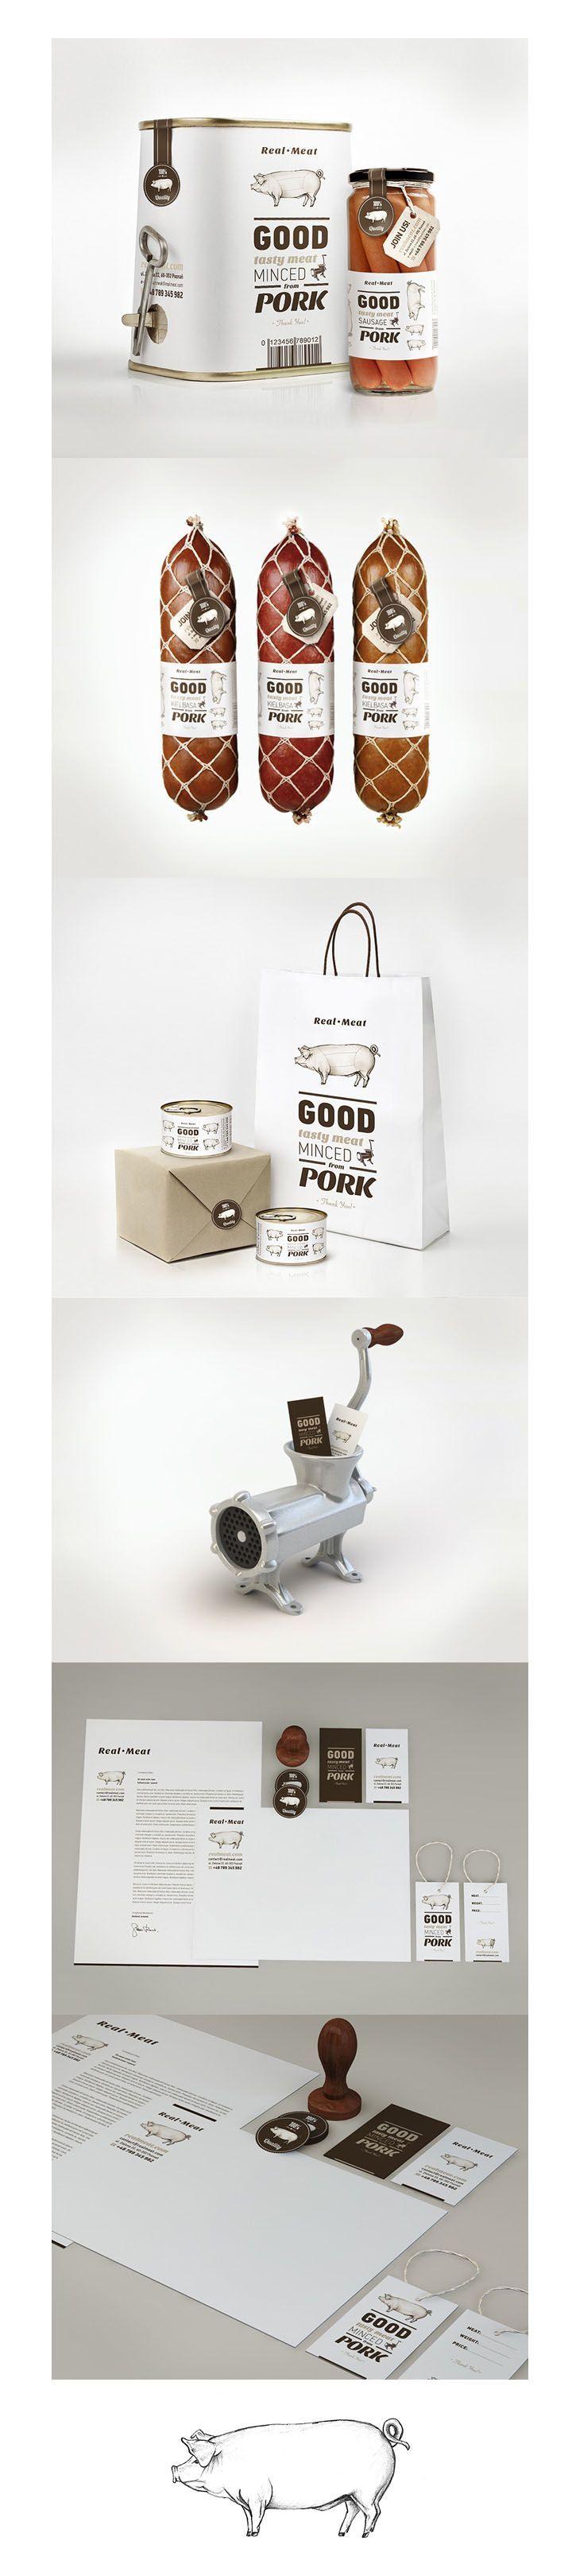 #Identity #packaging #branding